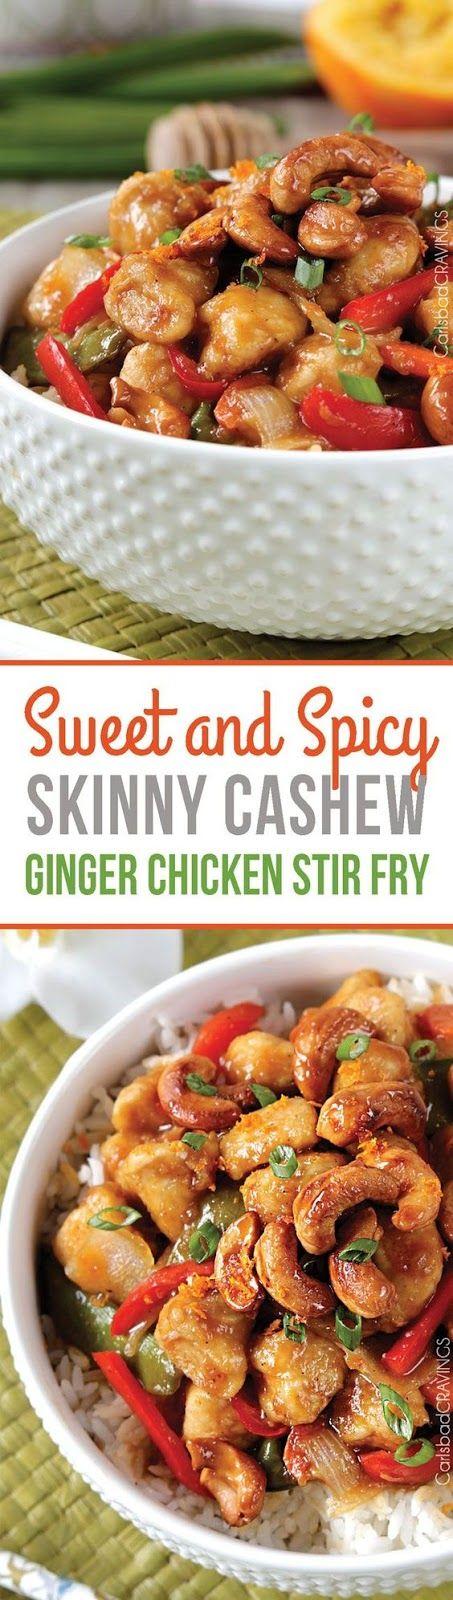 Caramelized Cashew Chicken Stir Fry Recipe